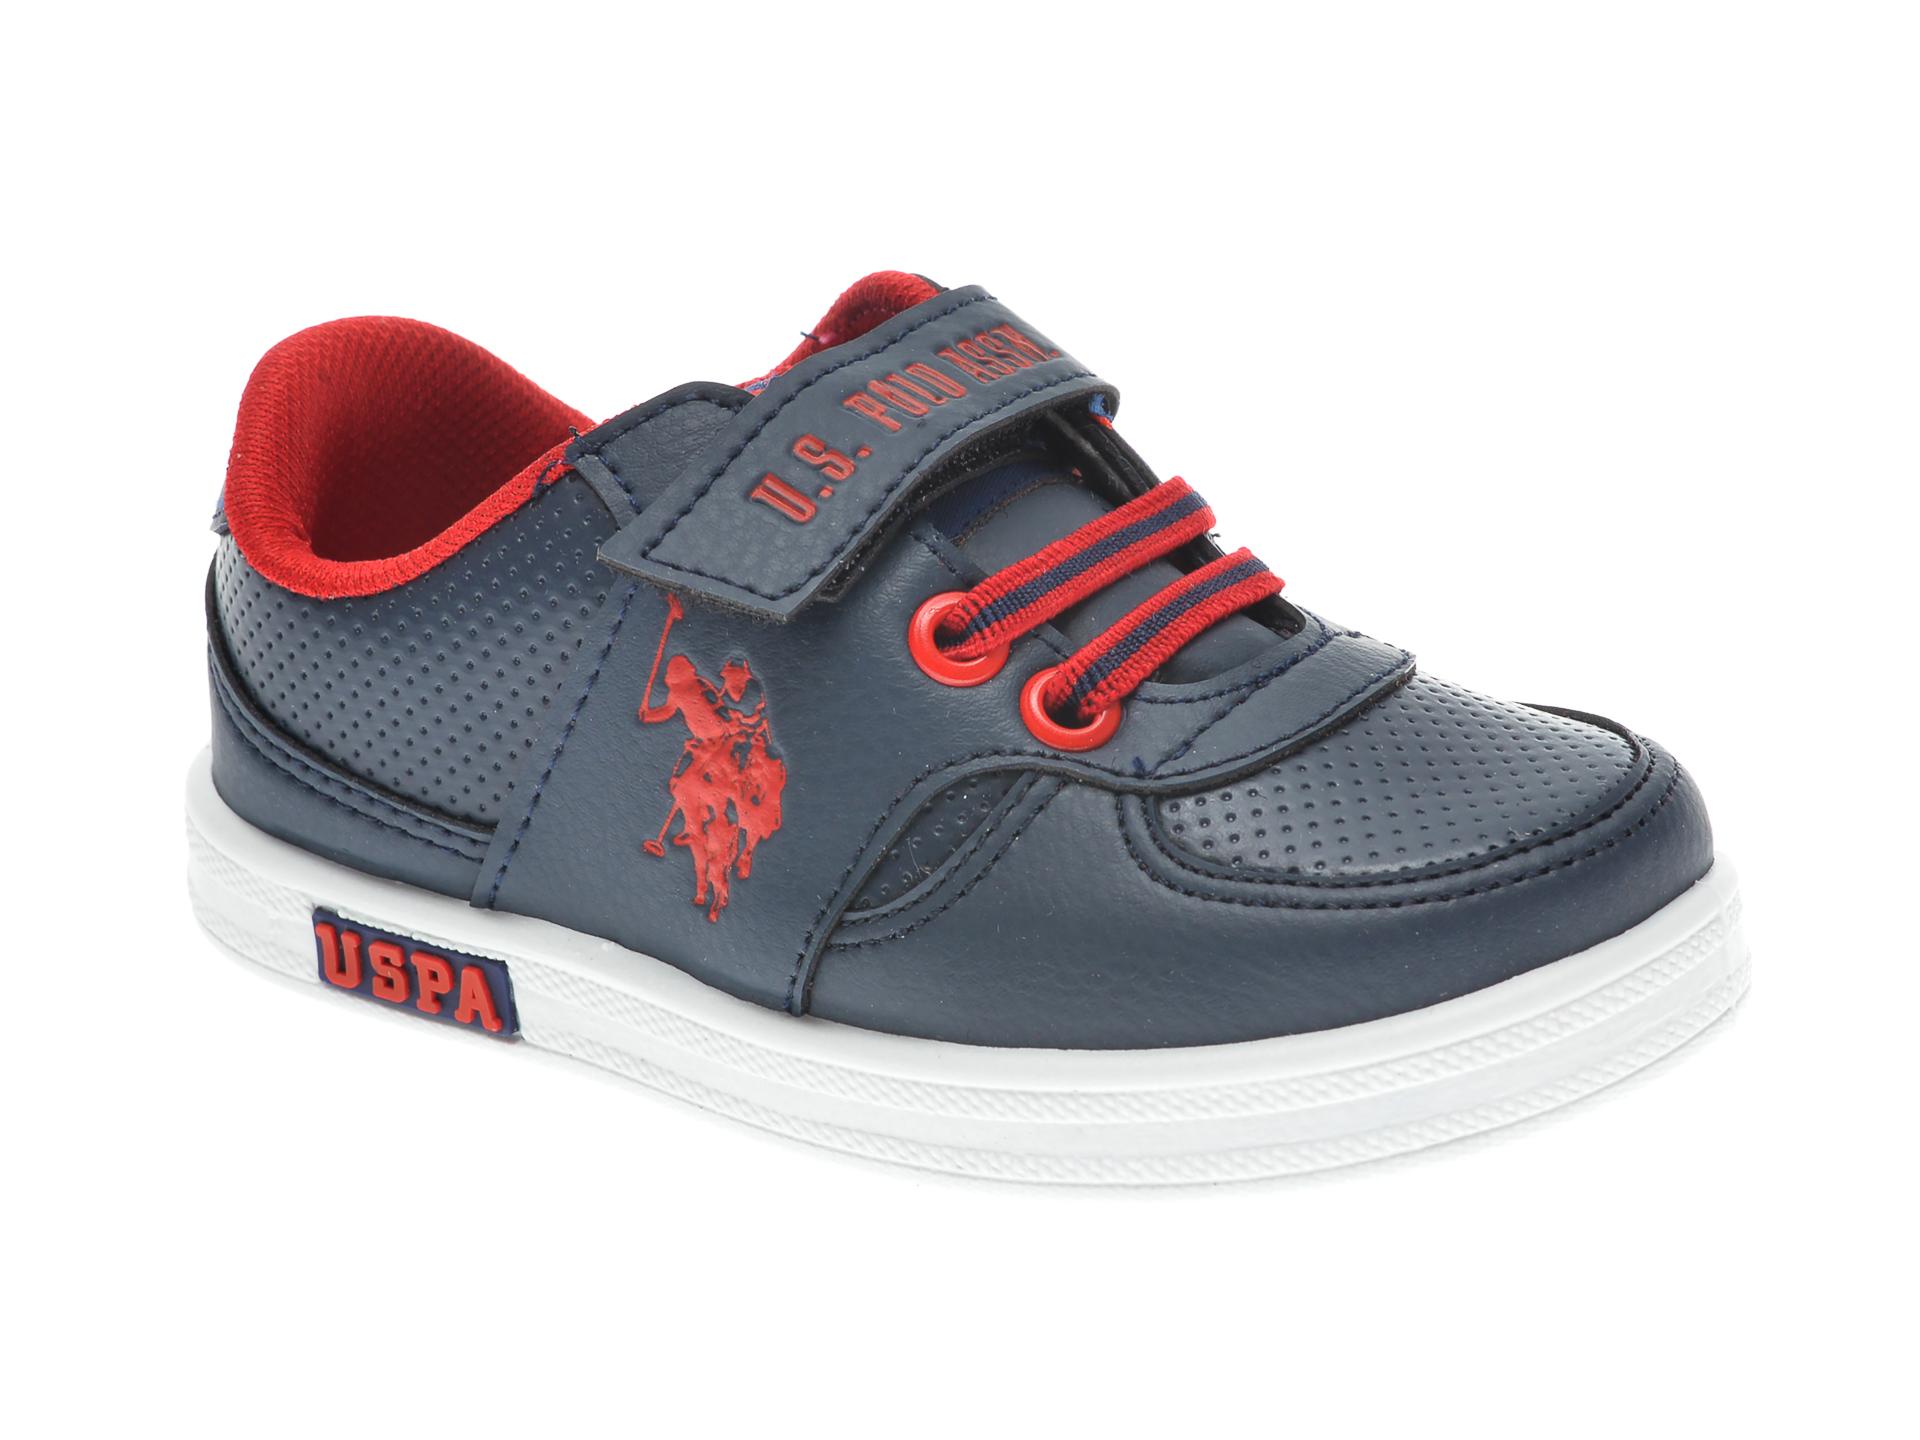 Pantofi sport US POLO ASSN bleumarin, 241650, din piele ecologica imagine